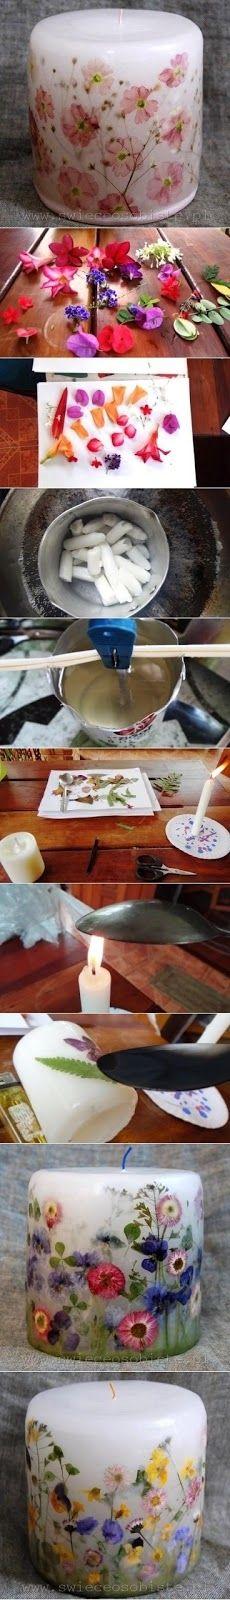 DIY Decorative Candle diy crafts craft ideas easy crafts diy ideas diy idea diy…